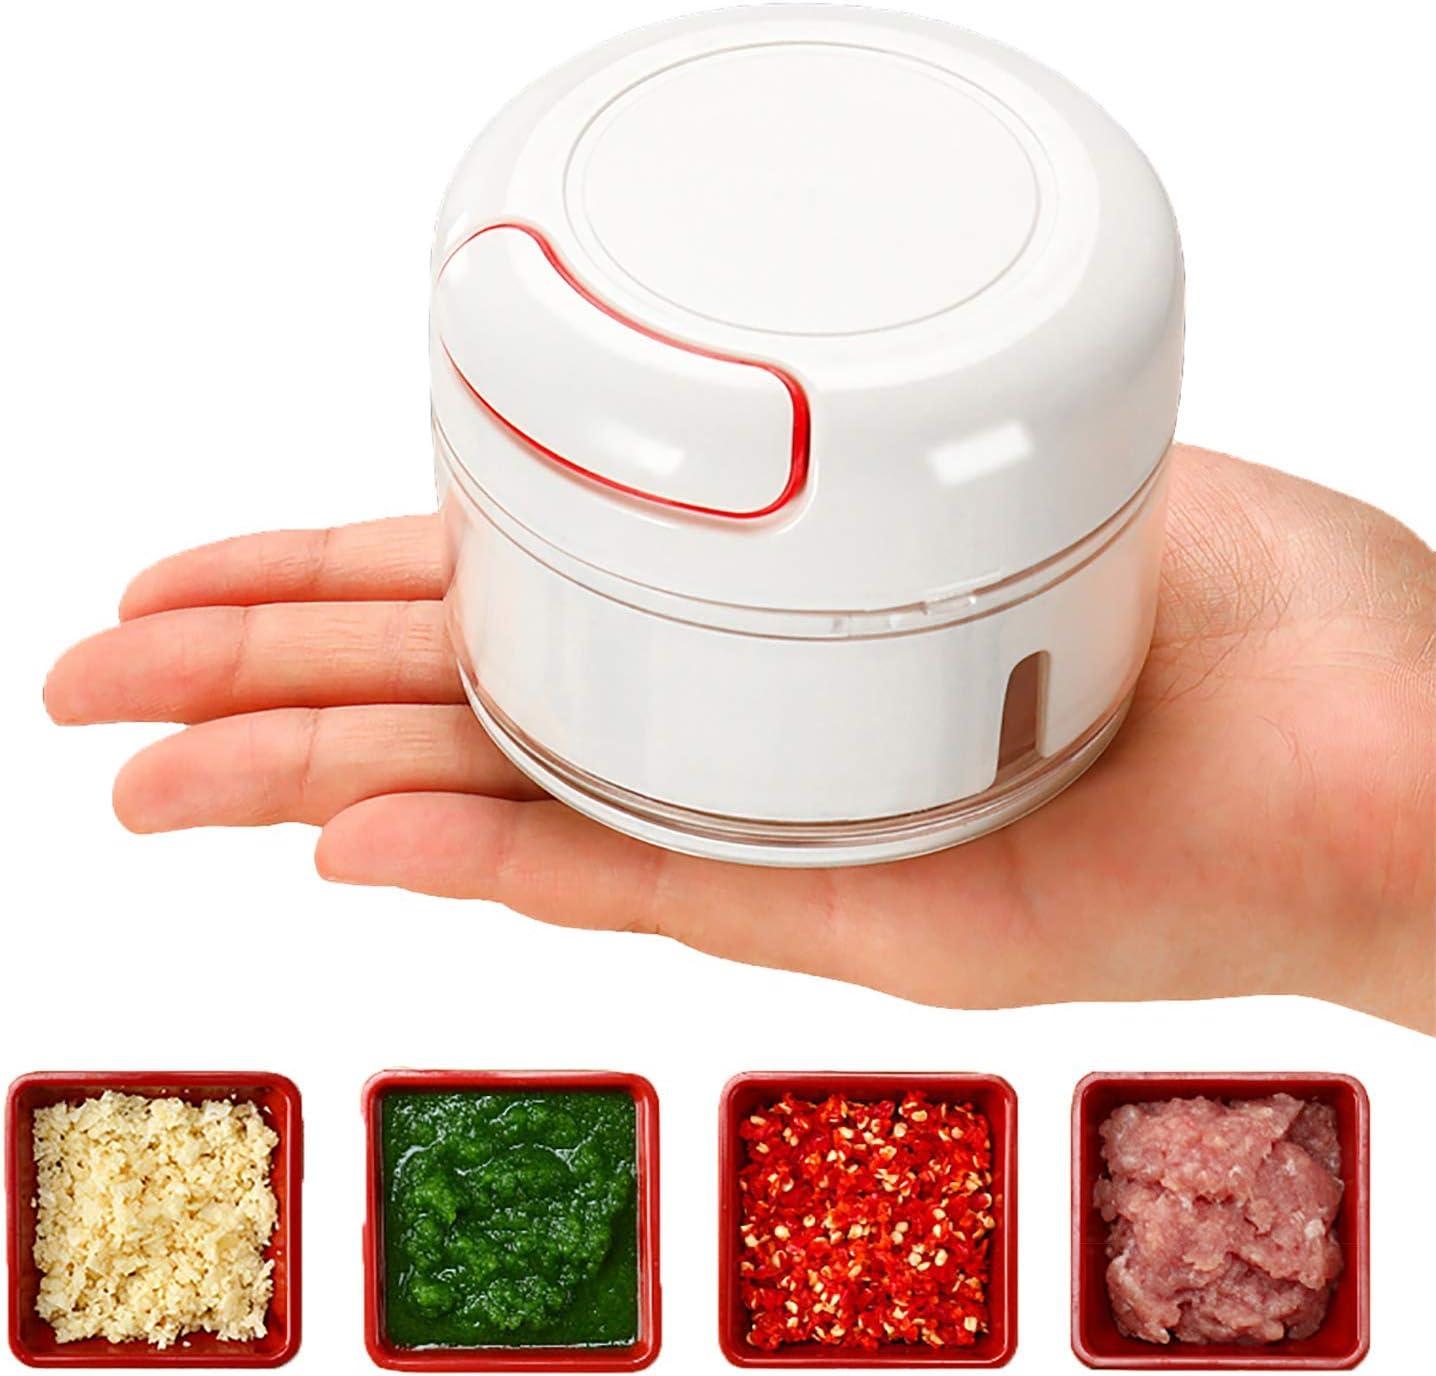 Mini Manual Food Chopper - Hand Pull Food Processor and Food cutter, Garlic Press Mincer Vegetable Grinder for Kitchen Gadgets